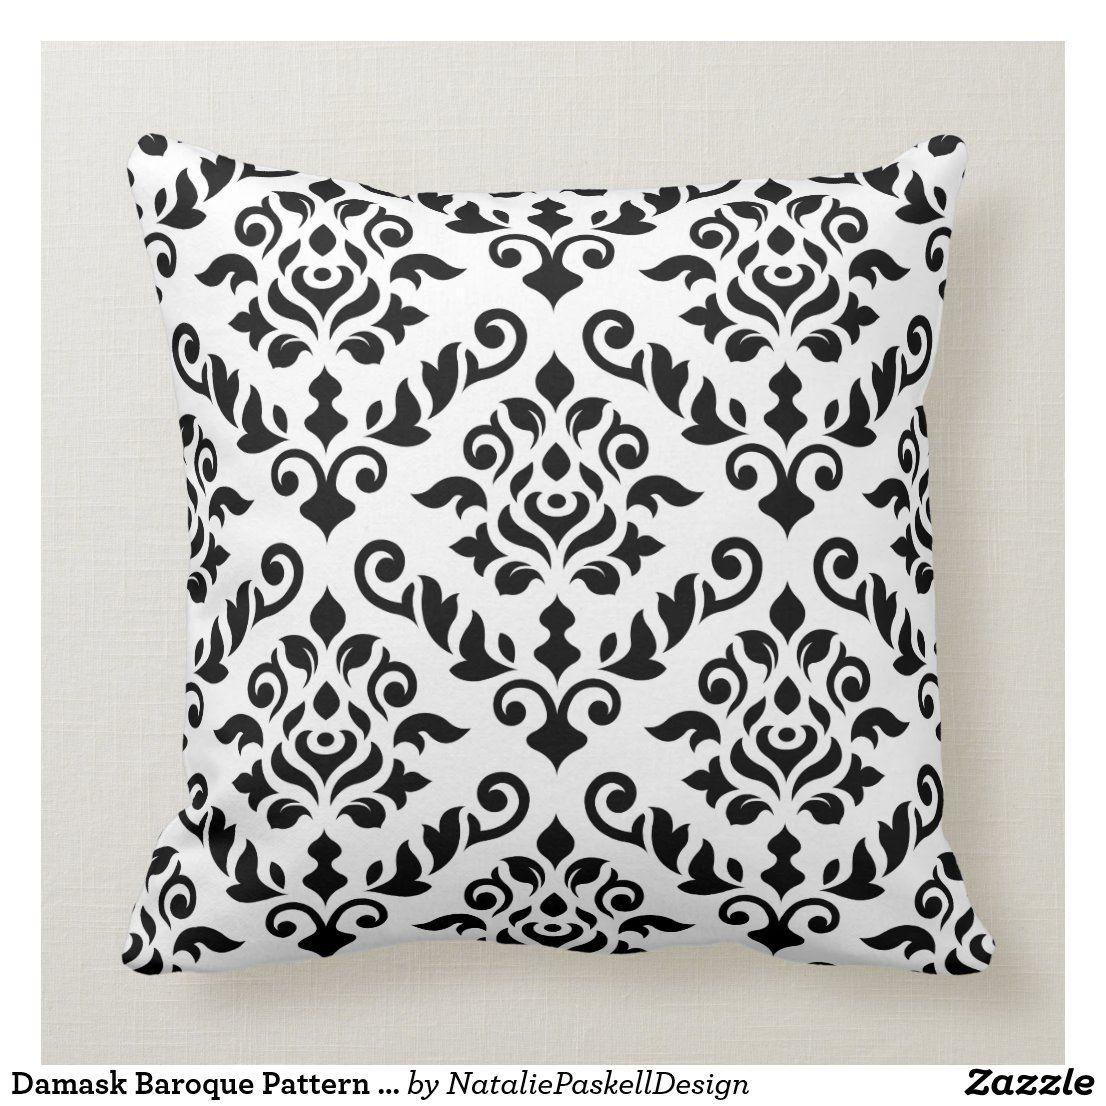 Pin By Katie Buchanan On Pillows Pillows And More Pillows Designer Decorative Pillows Pillow Cover Design Black Nursery